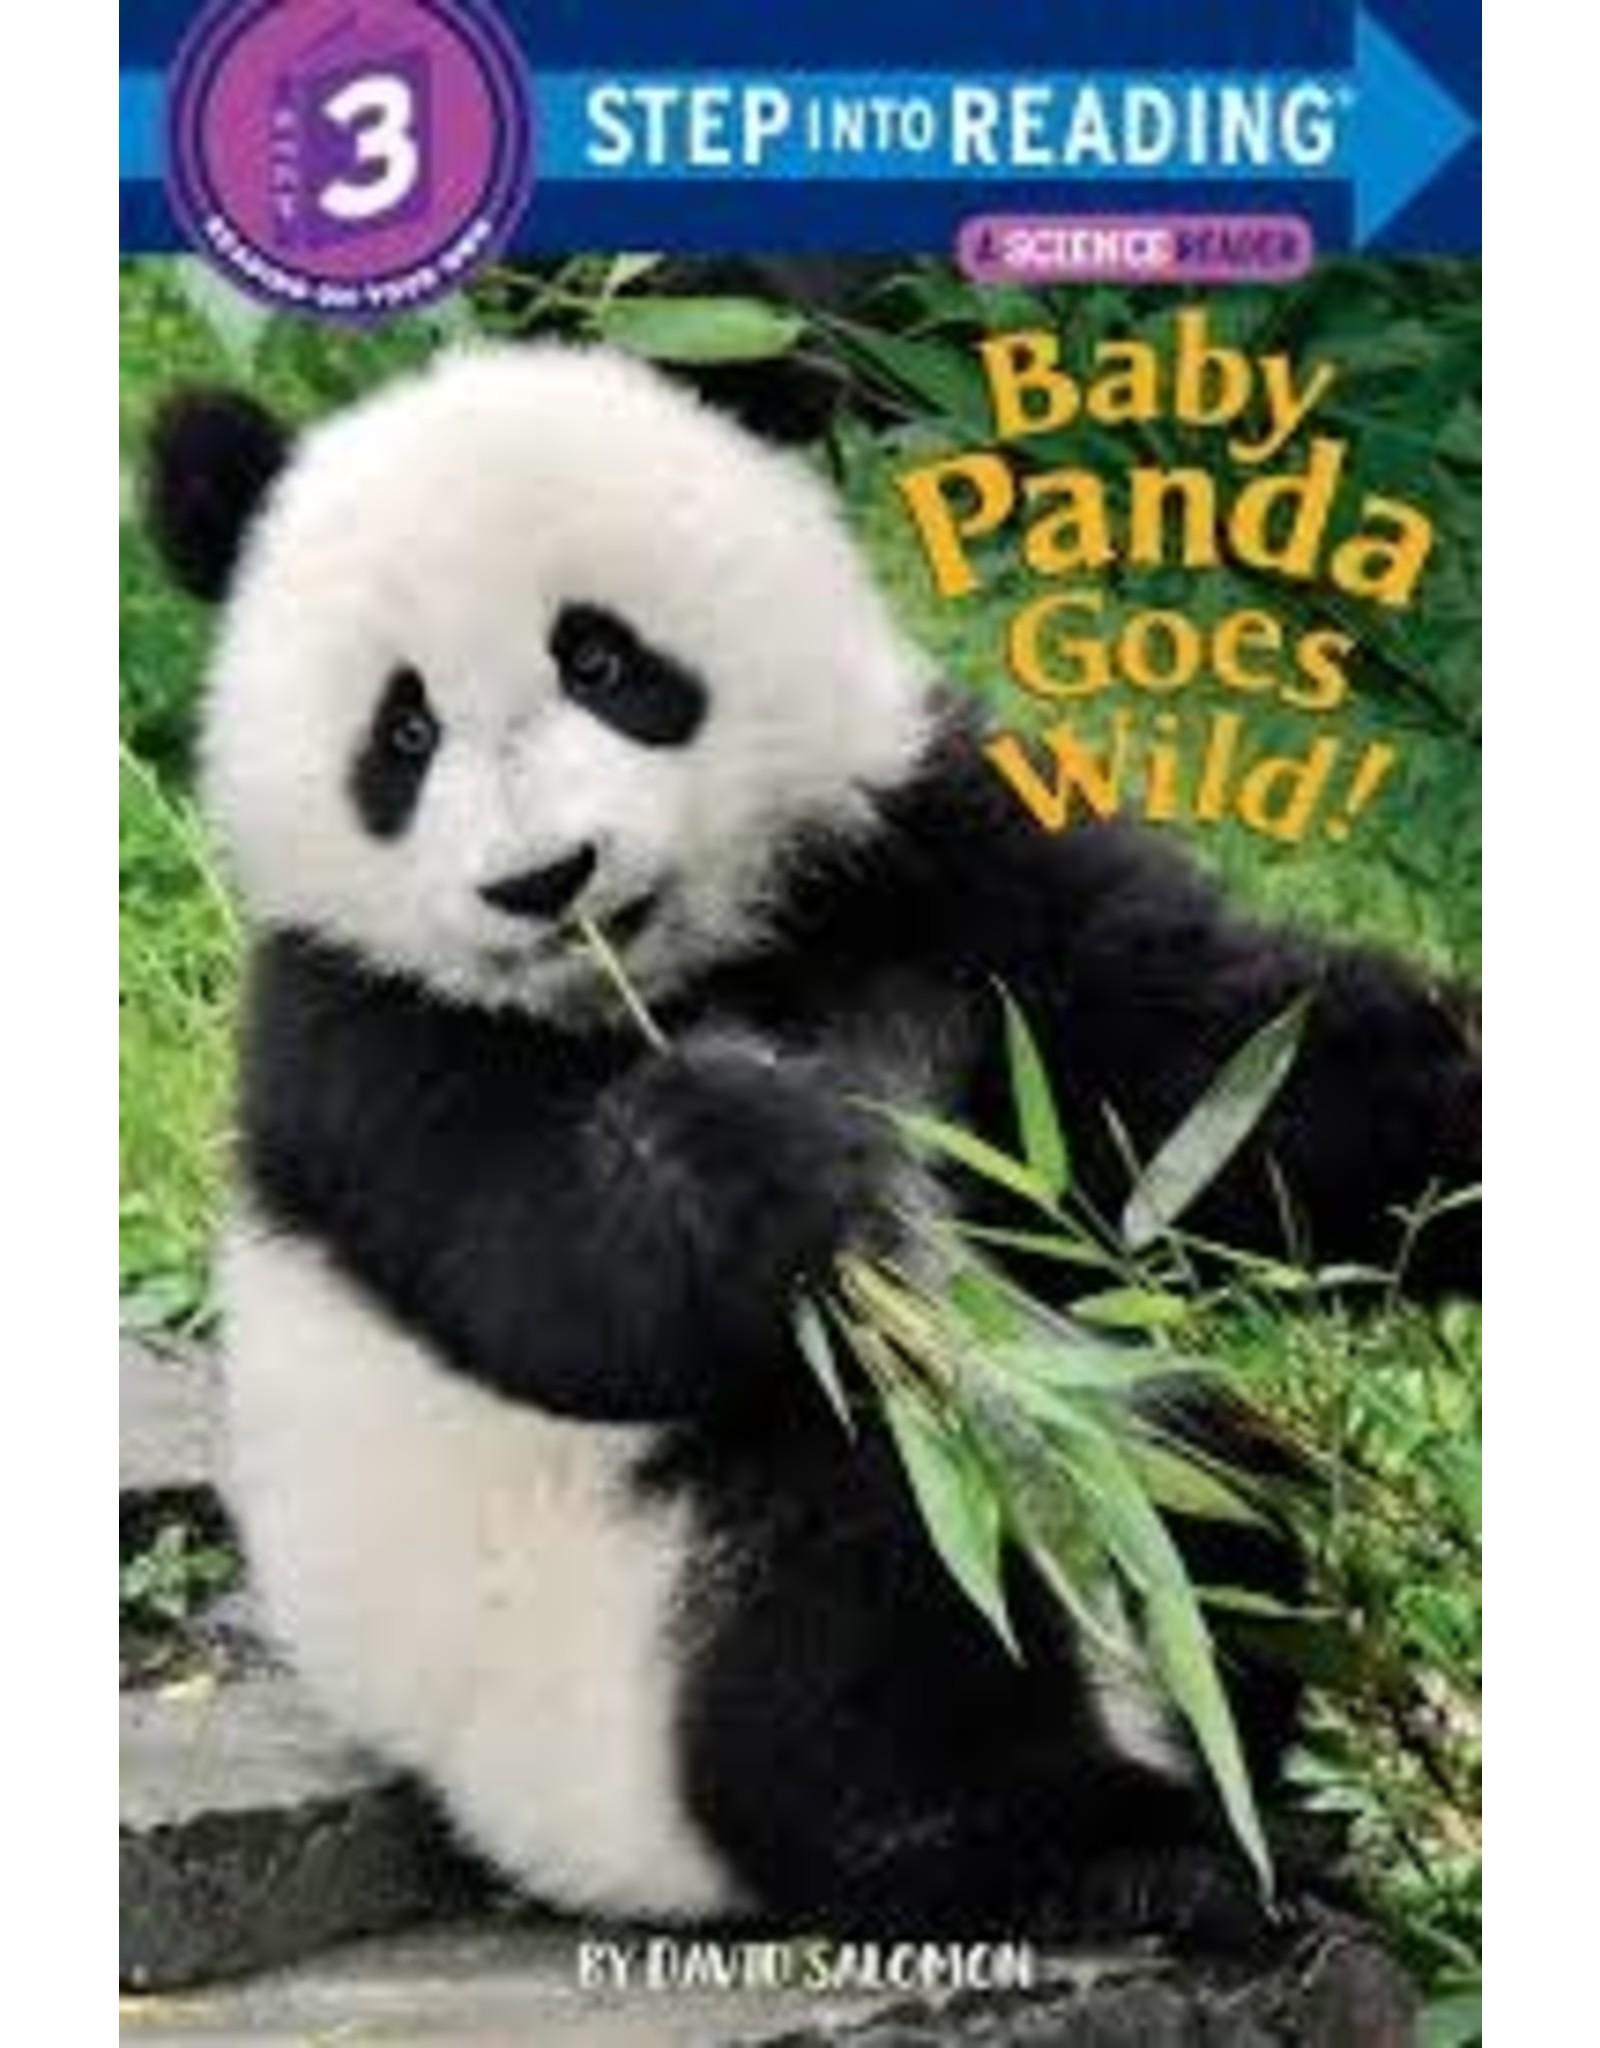 Step Into Reading Baby Pandas Go Wild!  S3